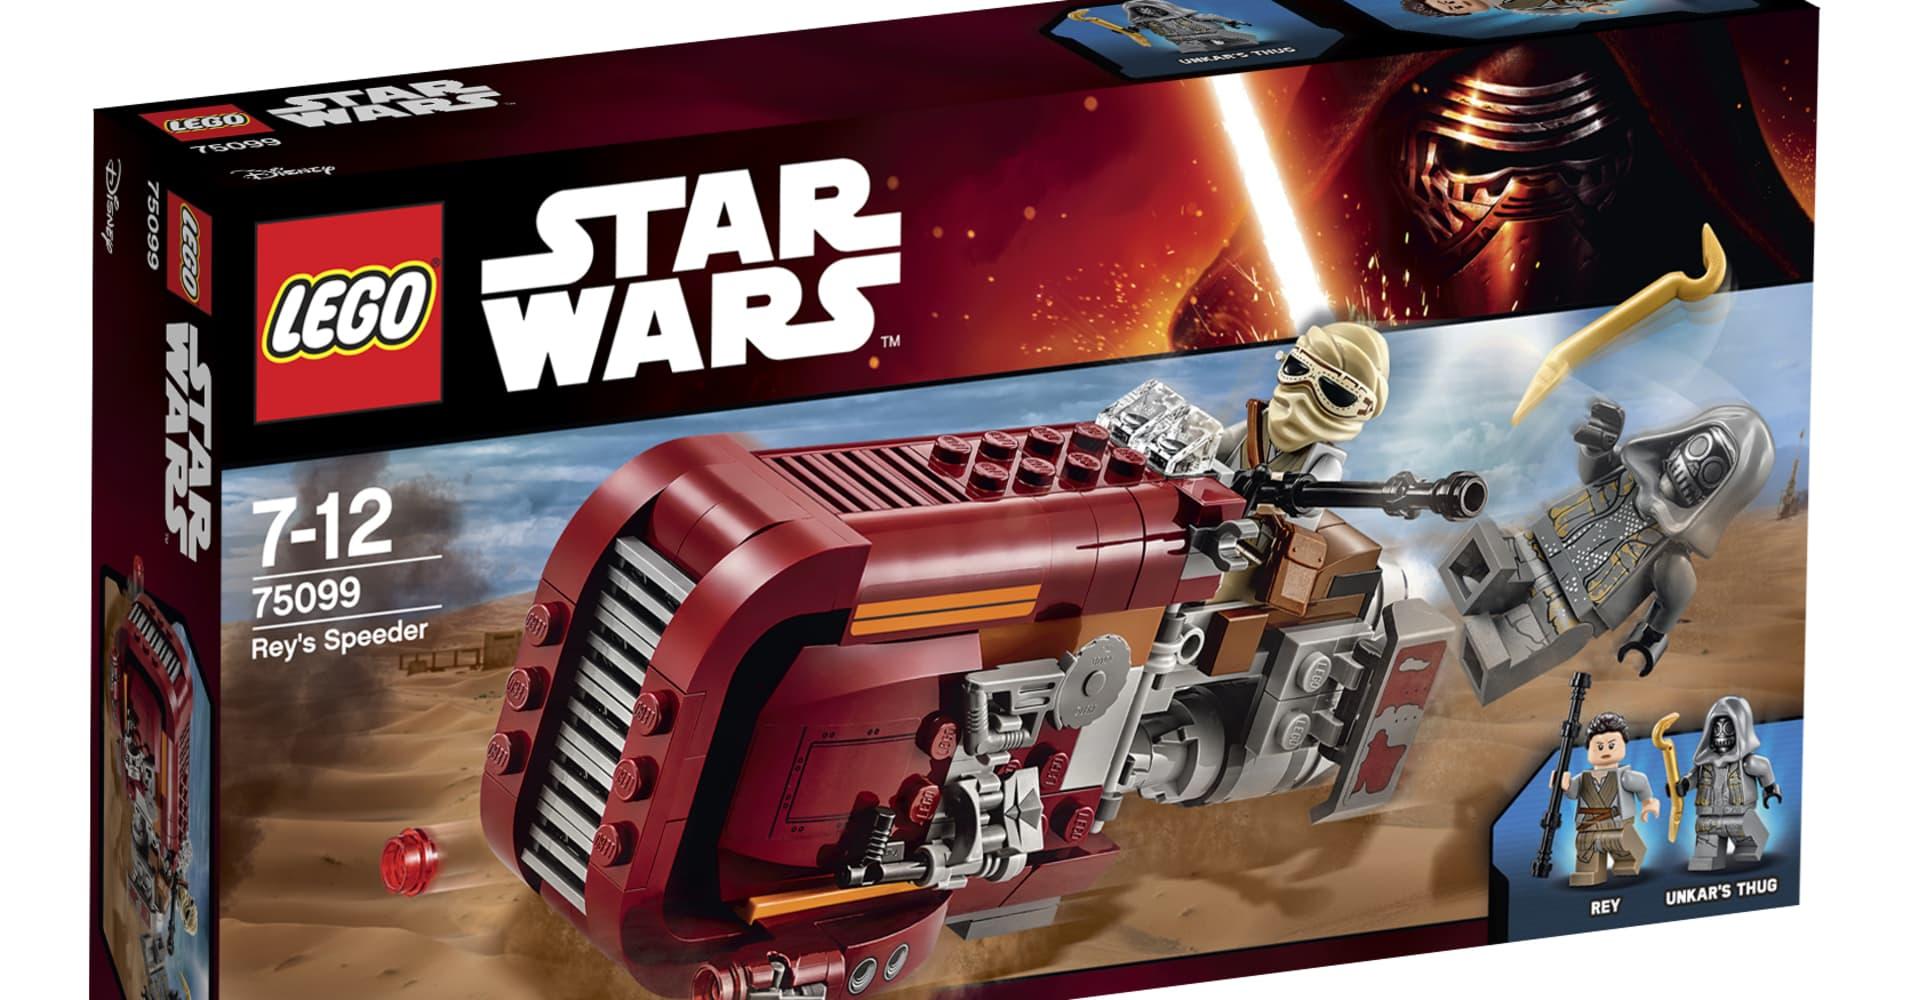 Star Wars Lego prototype development